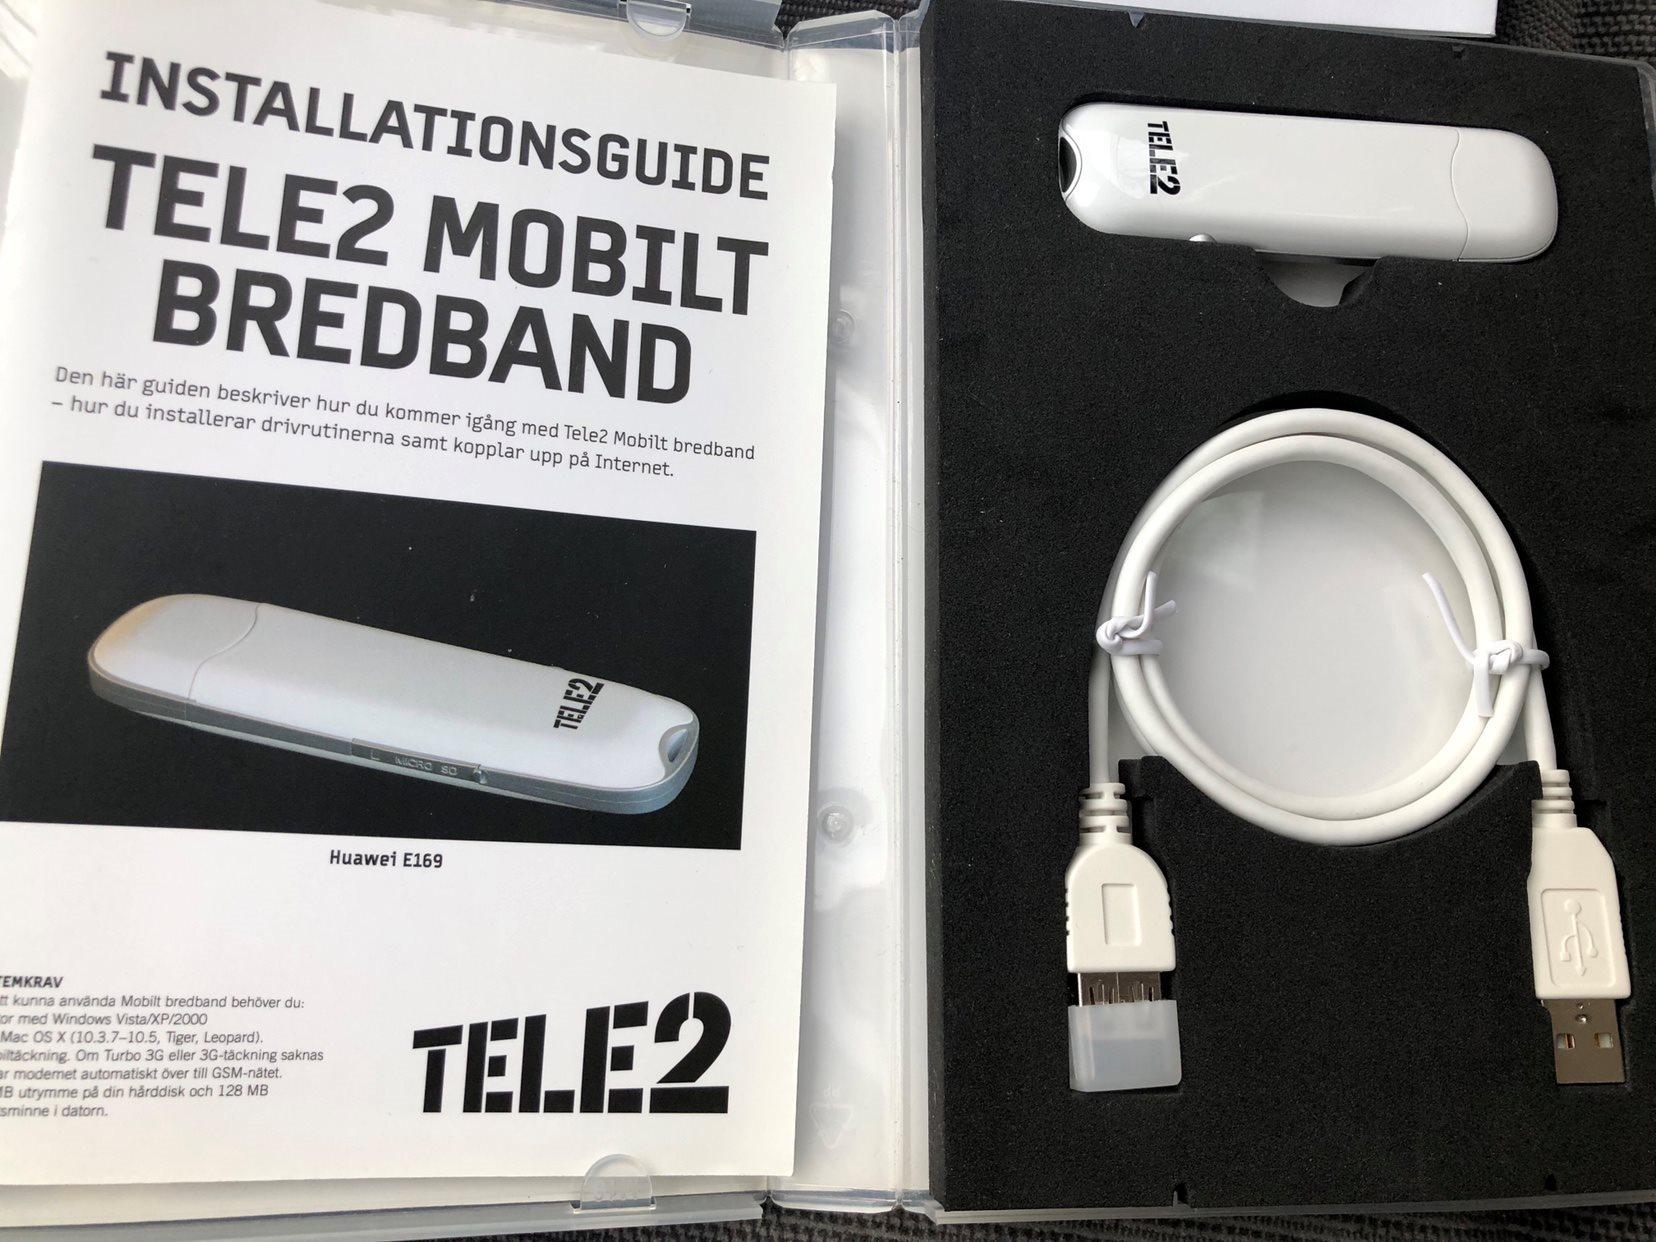 mobilt bredband med dator